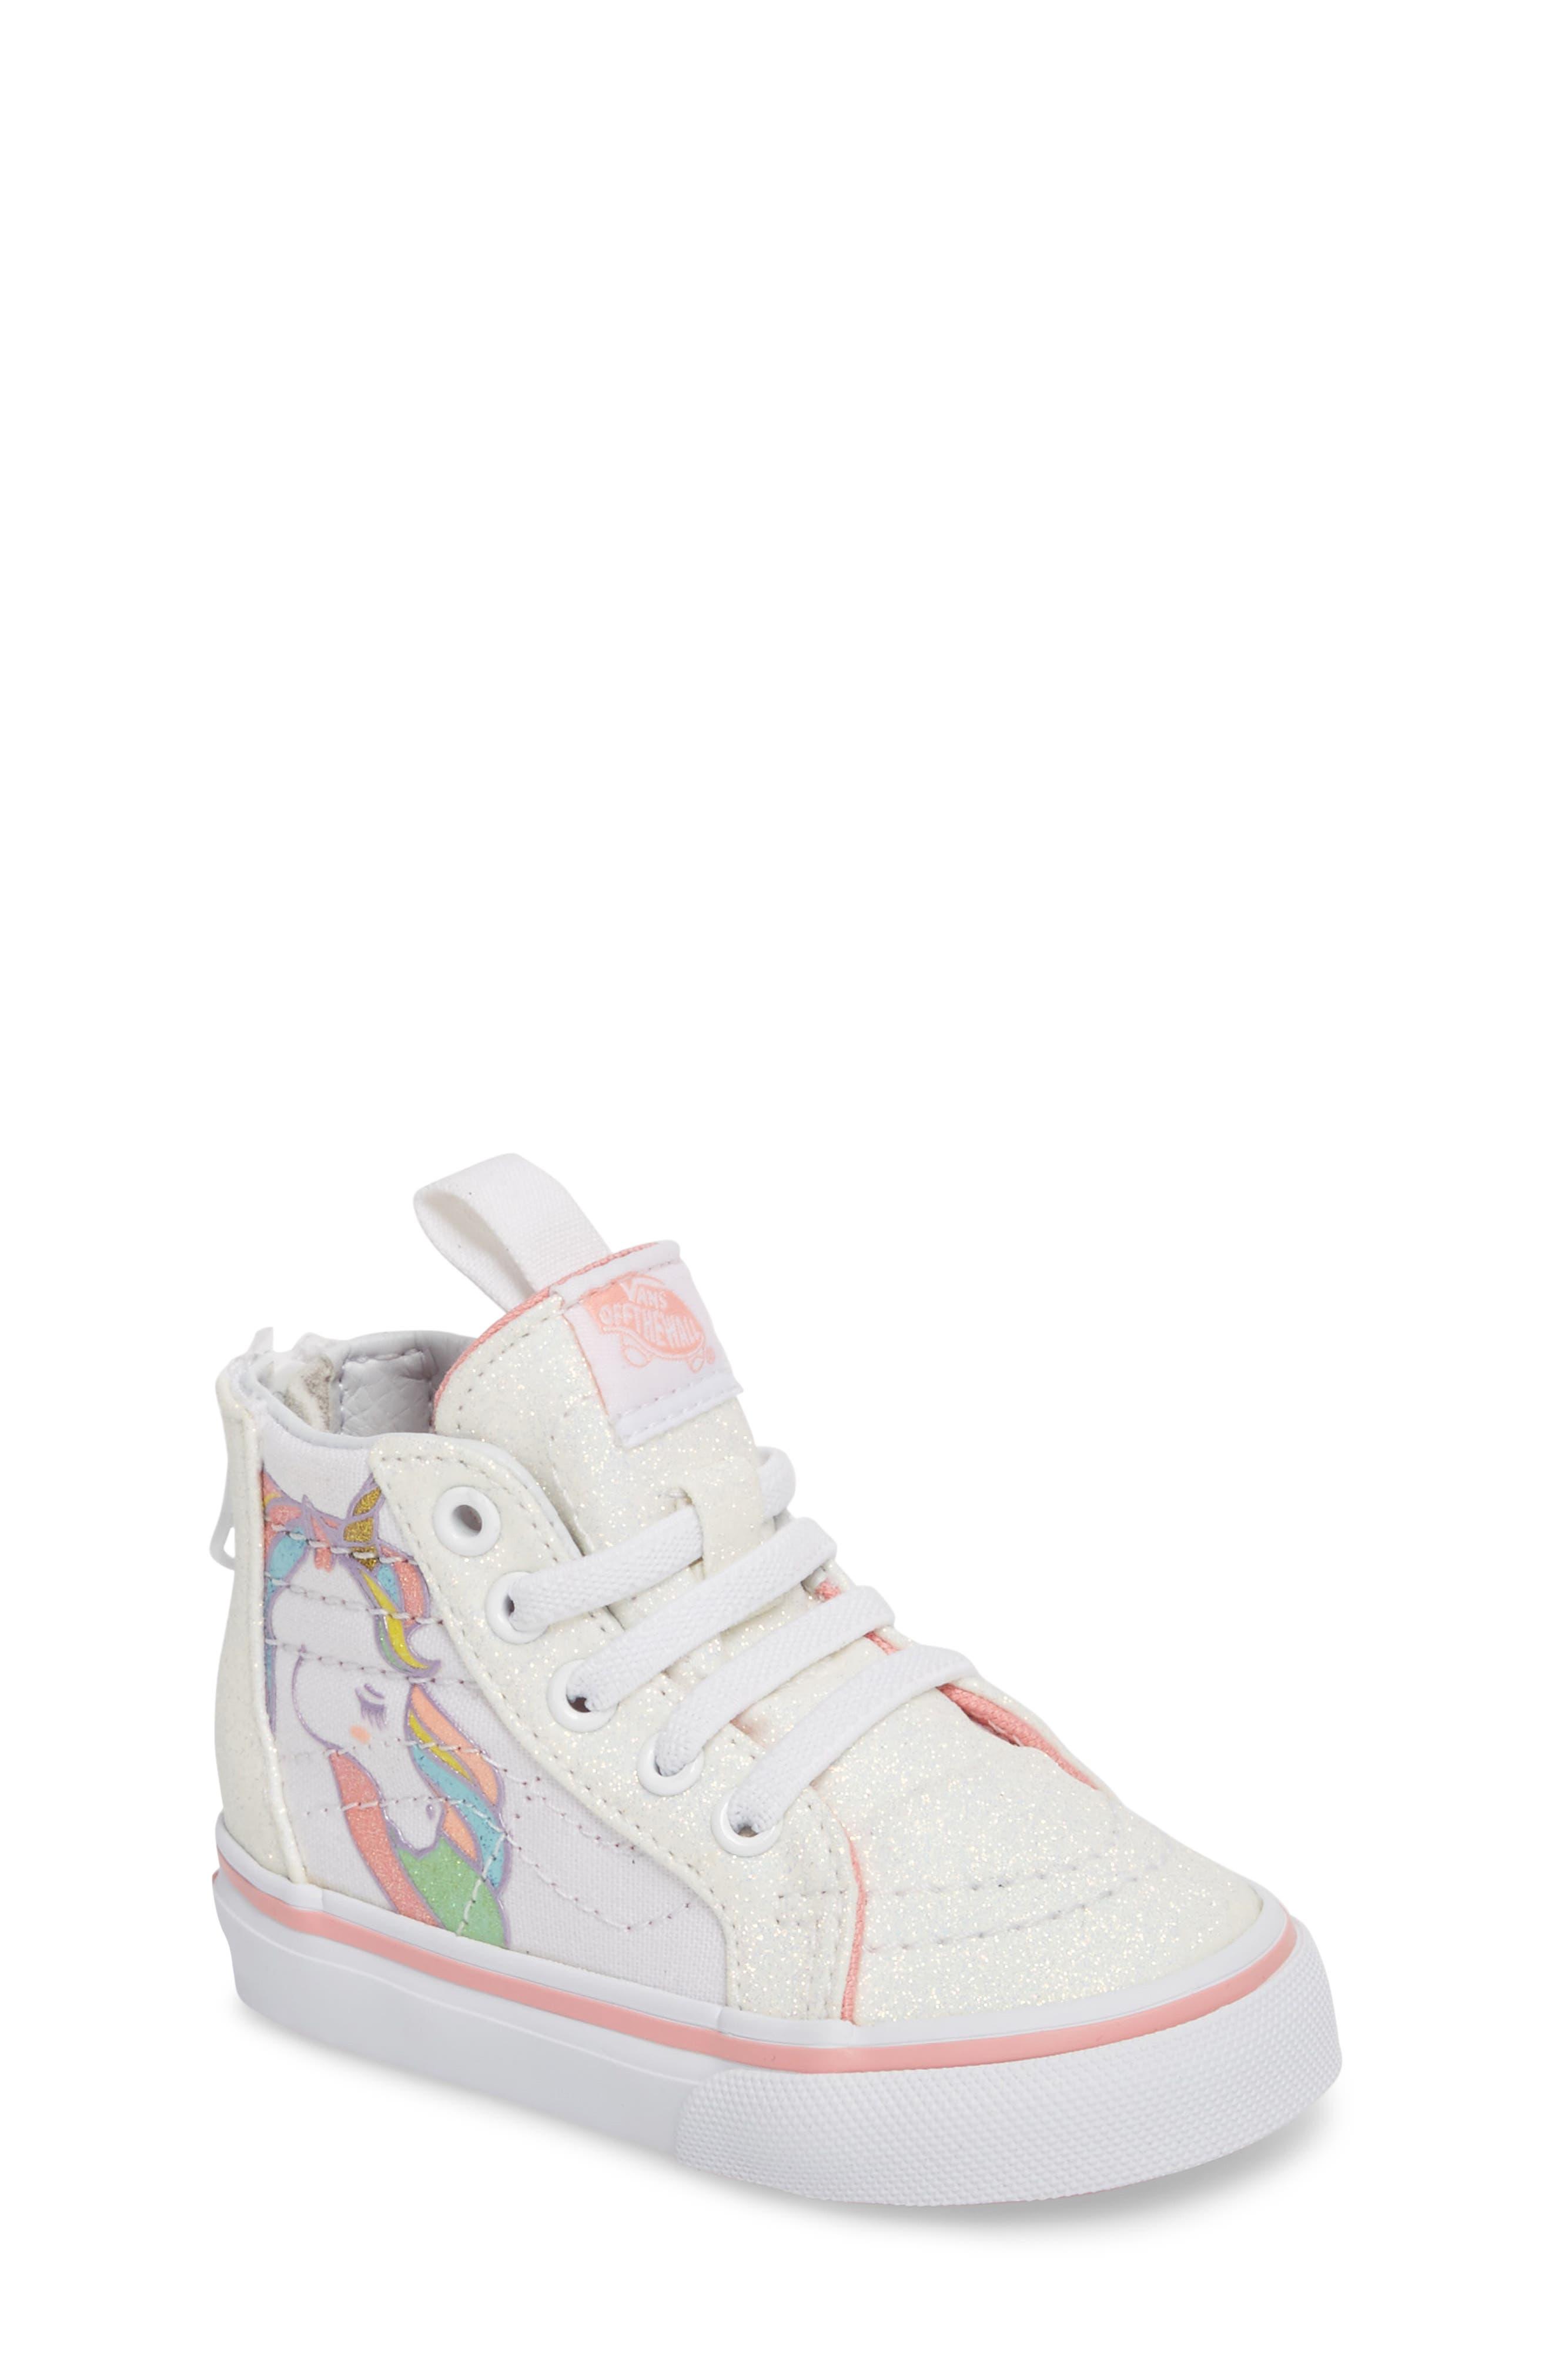 SK8-Hi Zip Glitter Unicorn Sneaker,                         Main,                         color, Unicorn Rainbow/ White Glitter